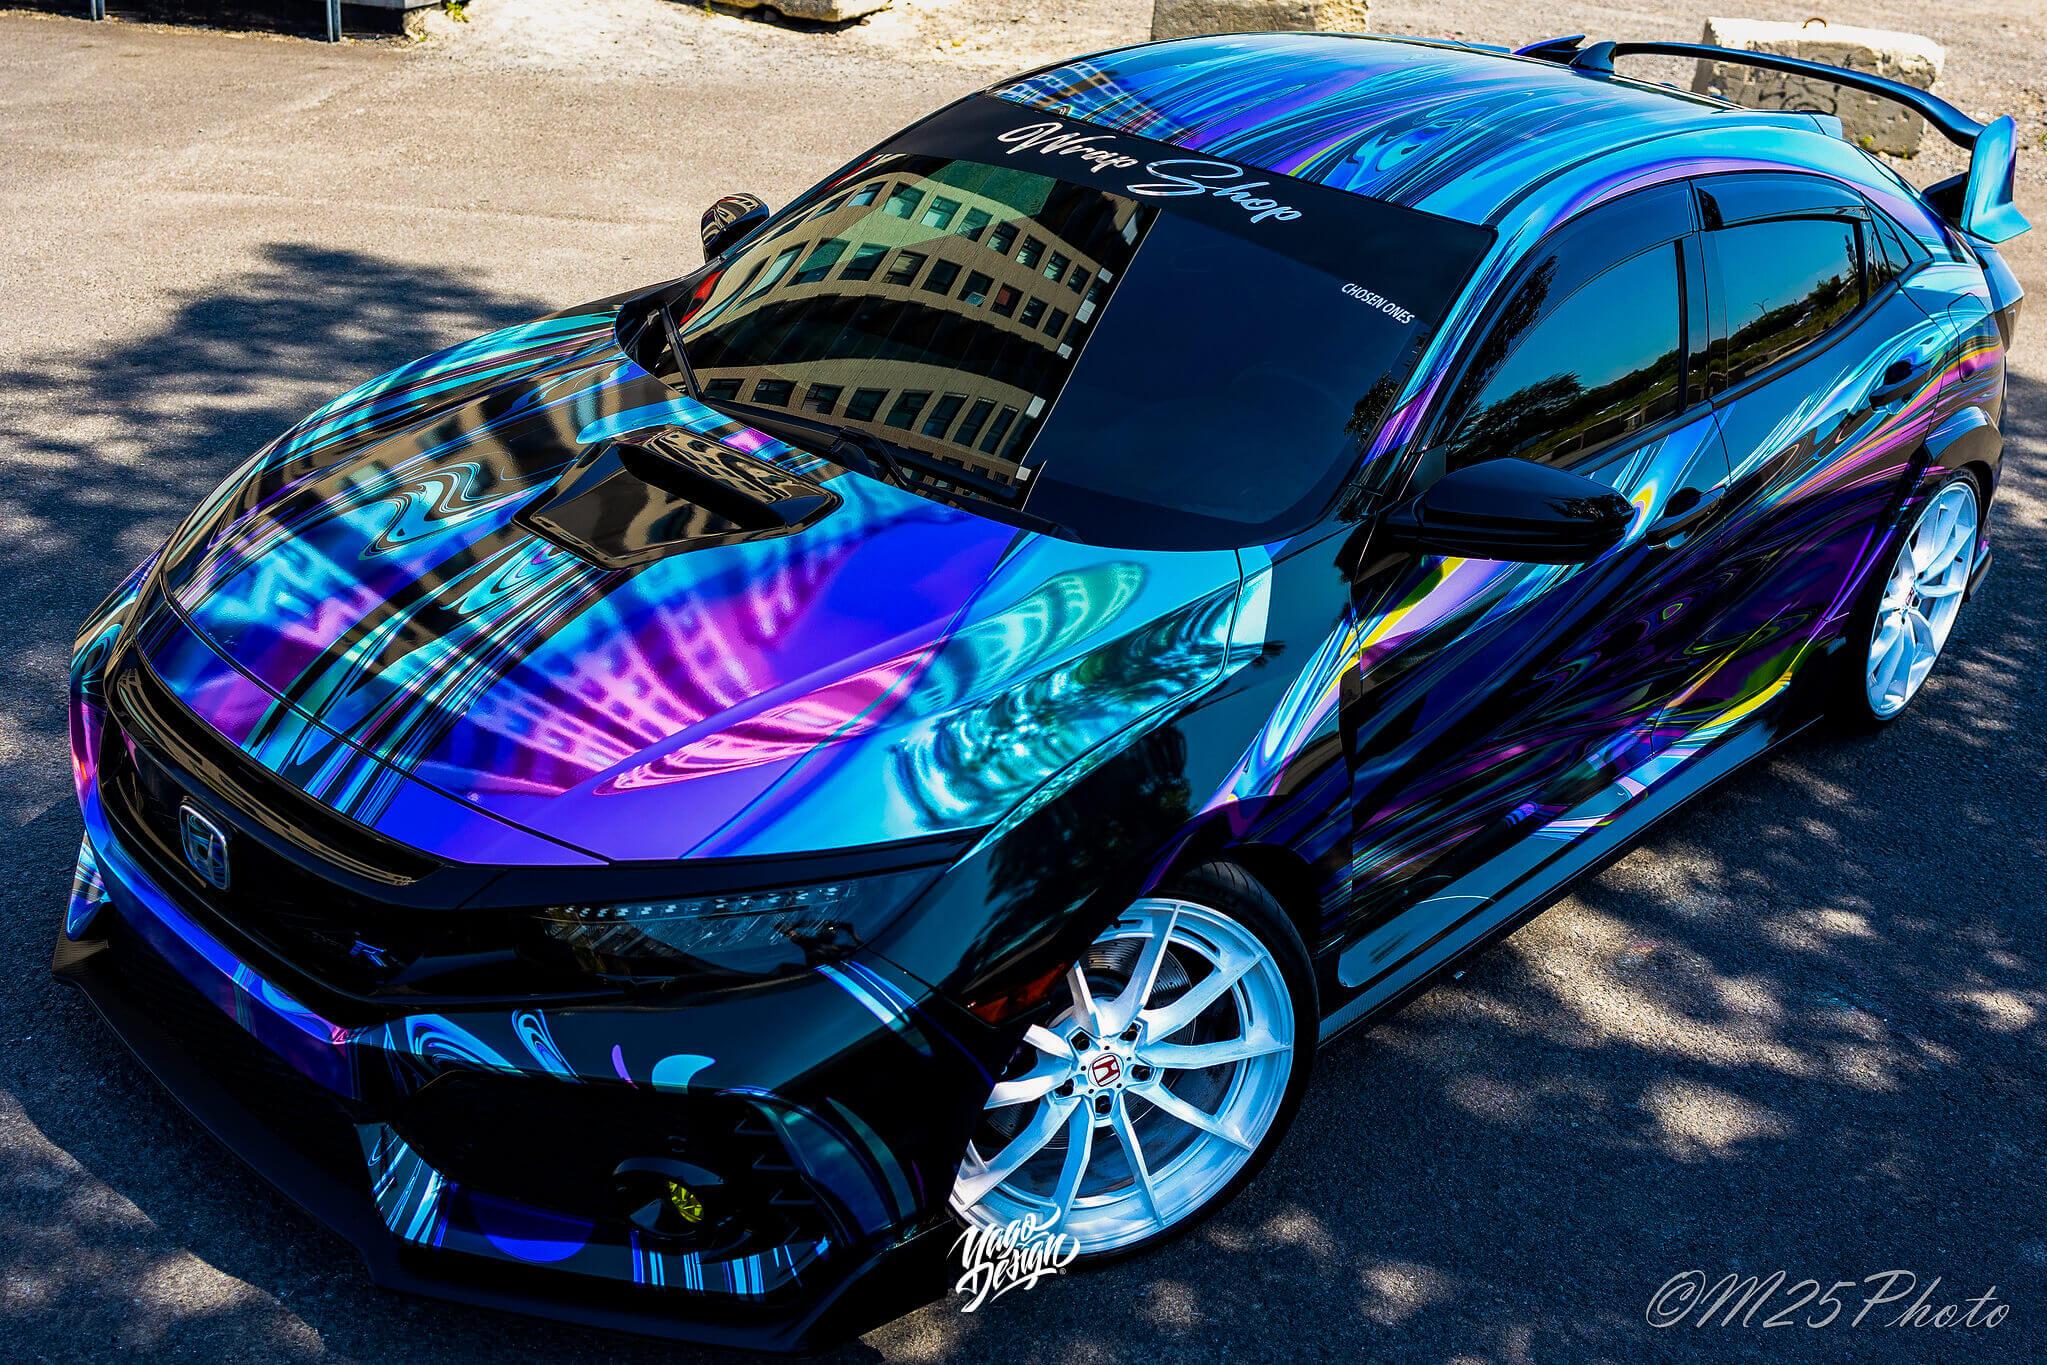 Honda Civic Type R Liquid Design psychodelic by Yagodesign (4)